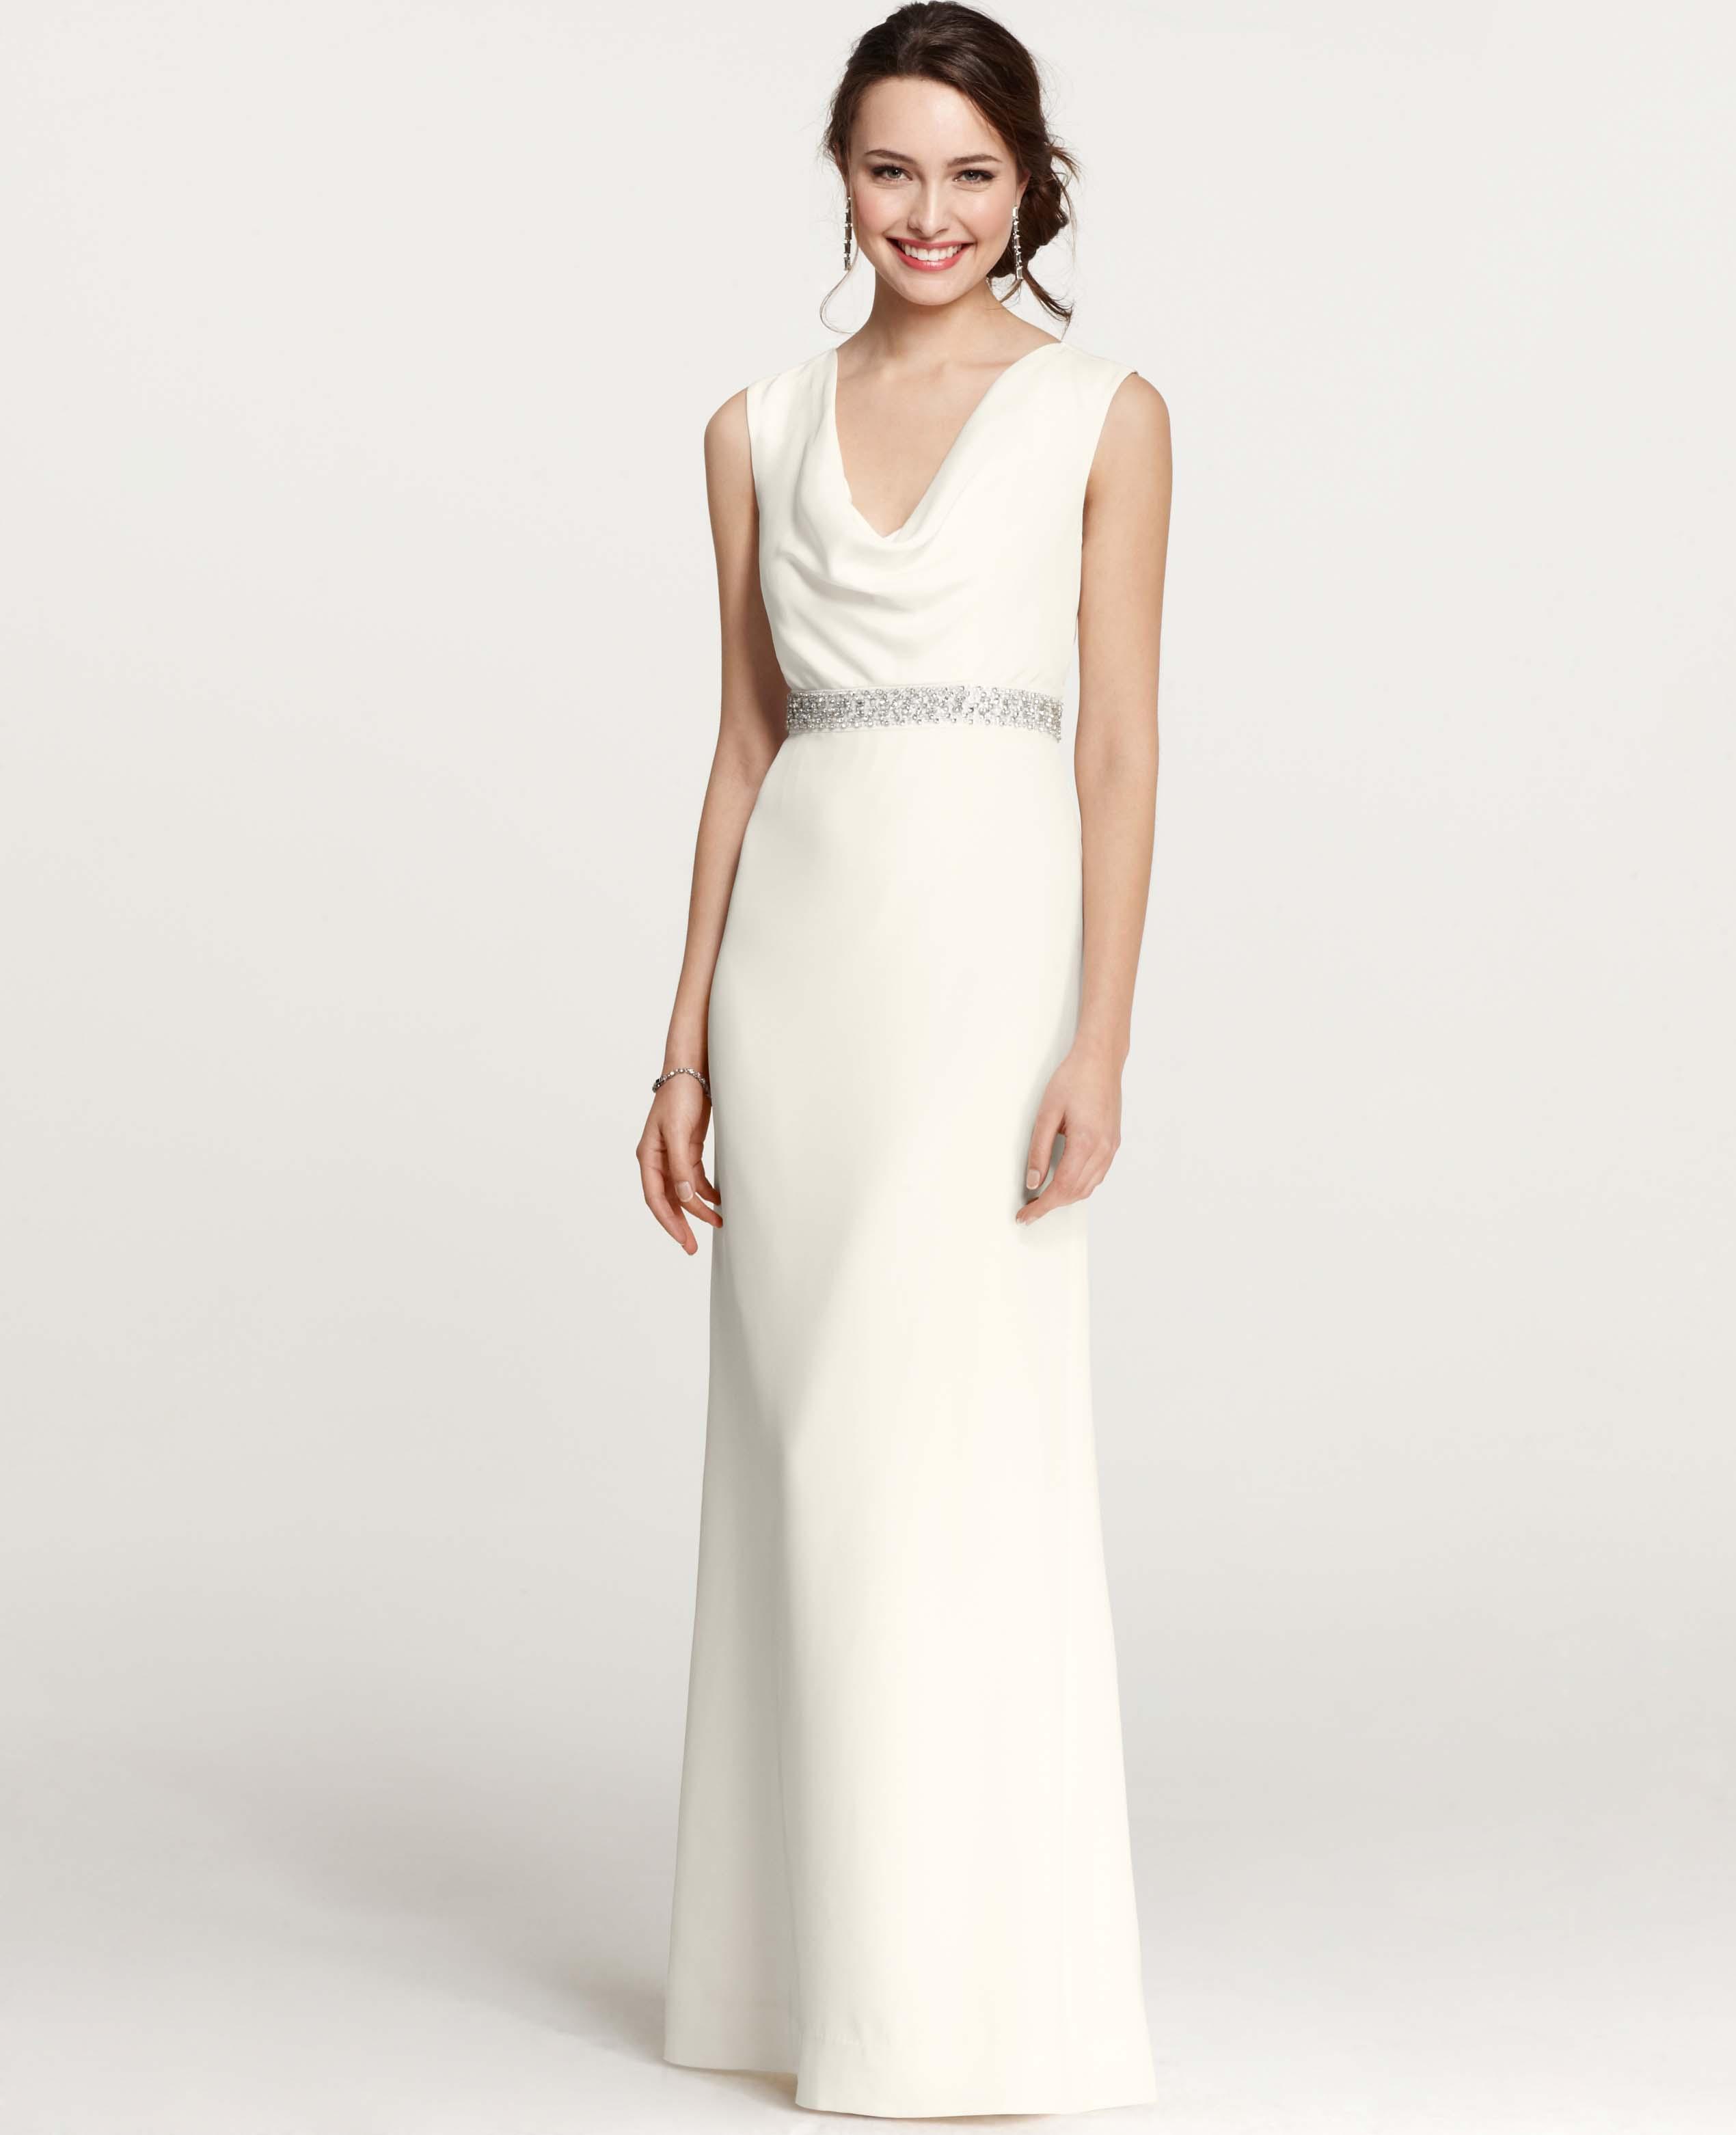 Lyst - Ann Taylor Petite Mya Cowl Neck Wedding Dress in White